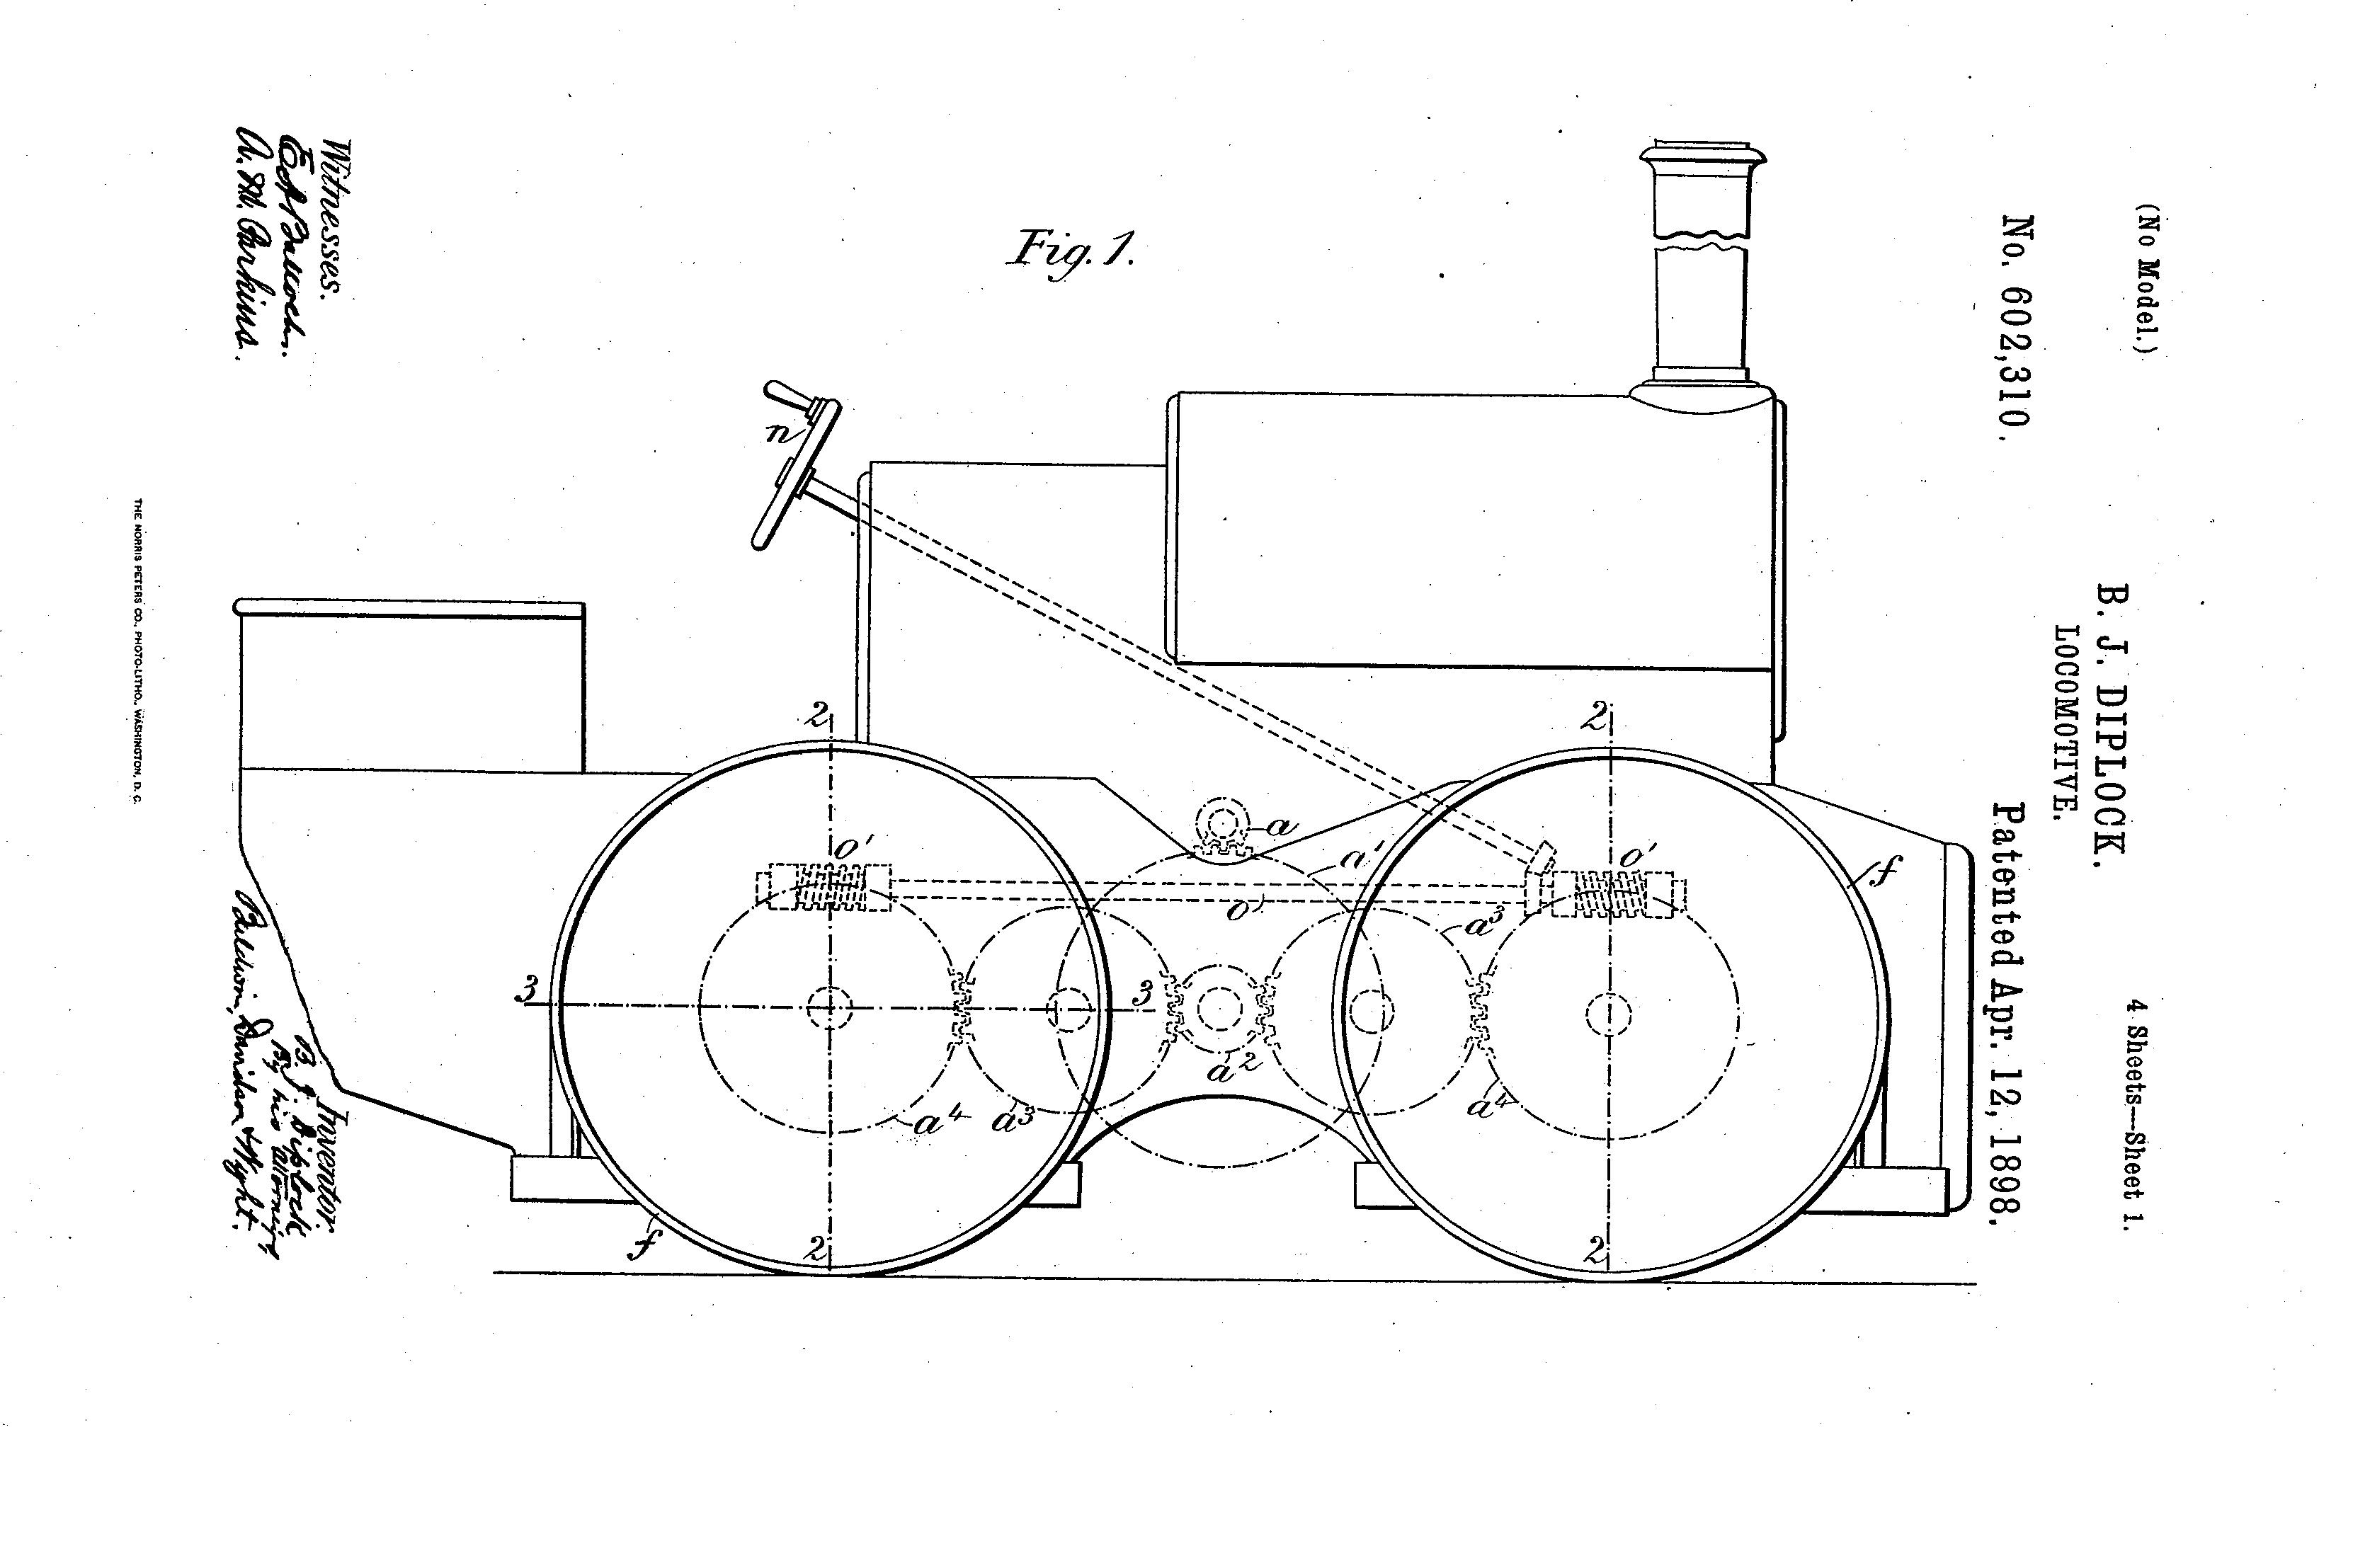 first four-wheel-drive Diploch four-wheel-drive locomotive